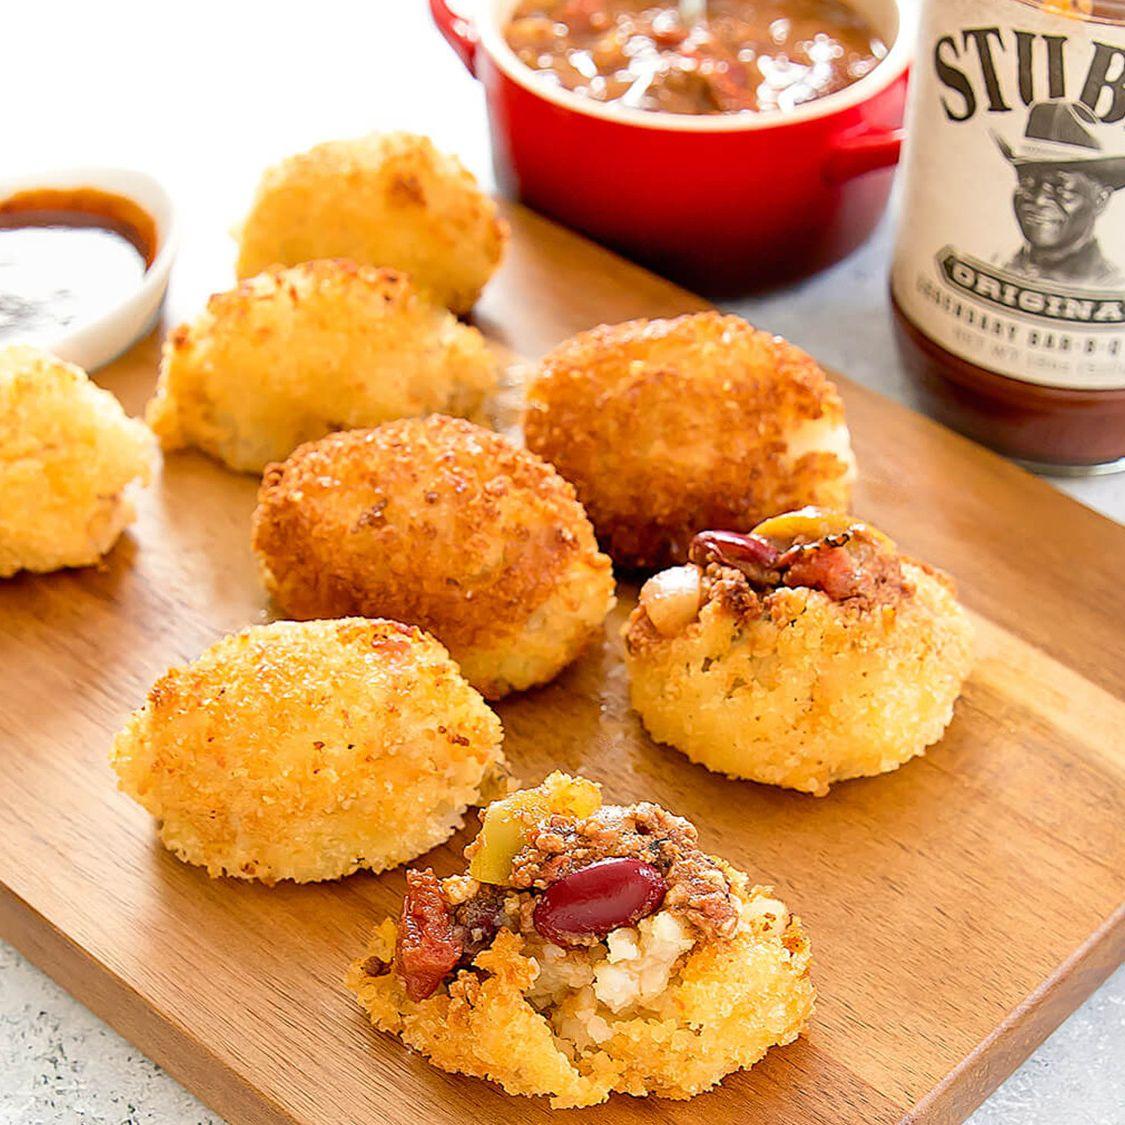 fried_mashed_potato_balls_stuffed_with_barbq_chili.jpg